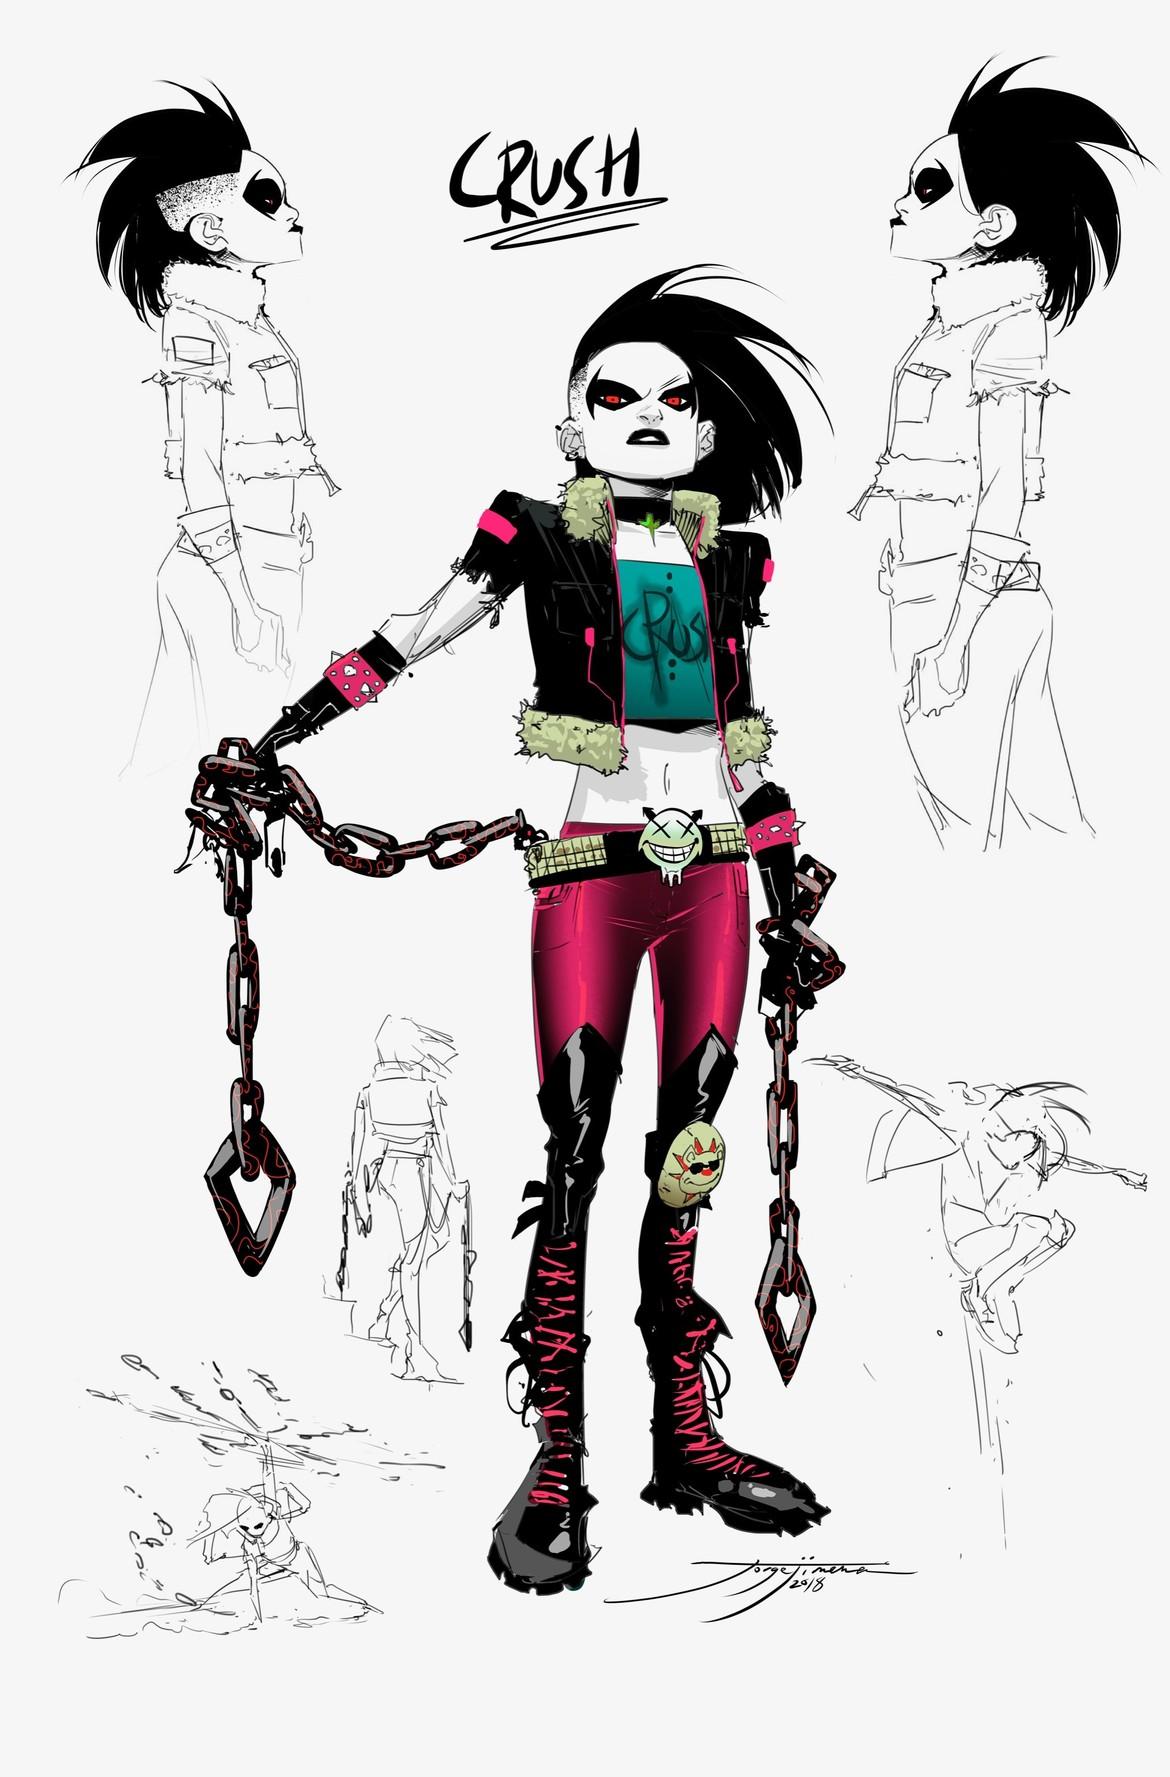 Teen Titans - Crush, Concept Art by Robson Rocha